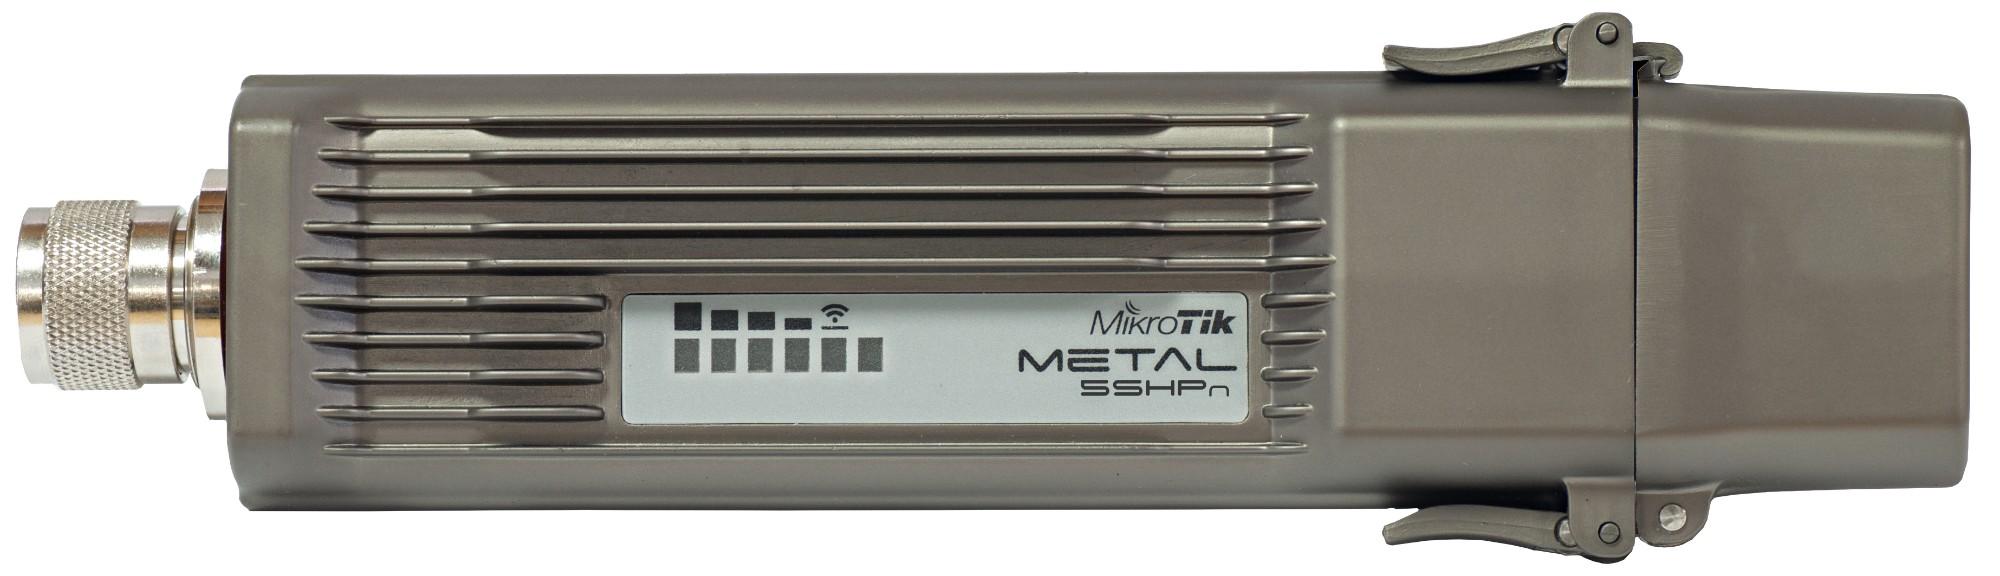 Mikrotik Metal 5SHPn Power over Ethernet (PoE) Grey WLAN access point